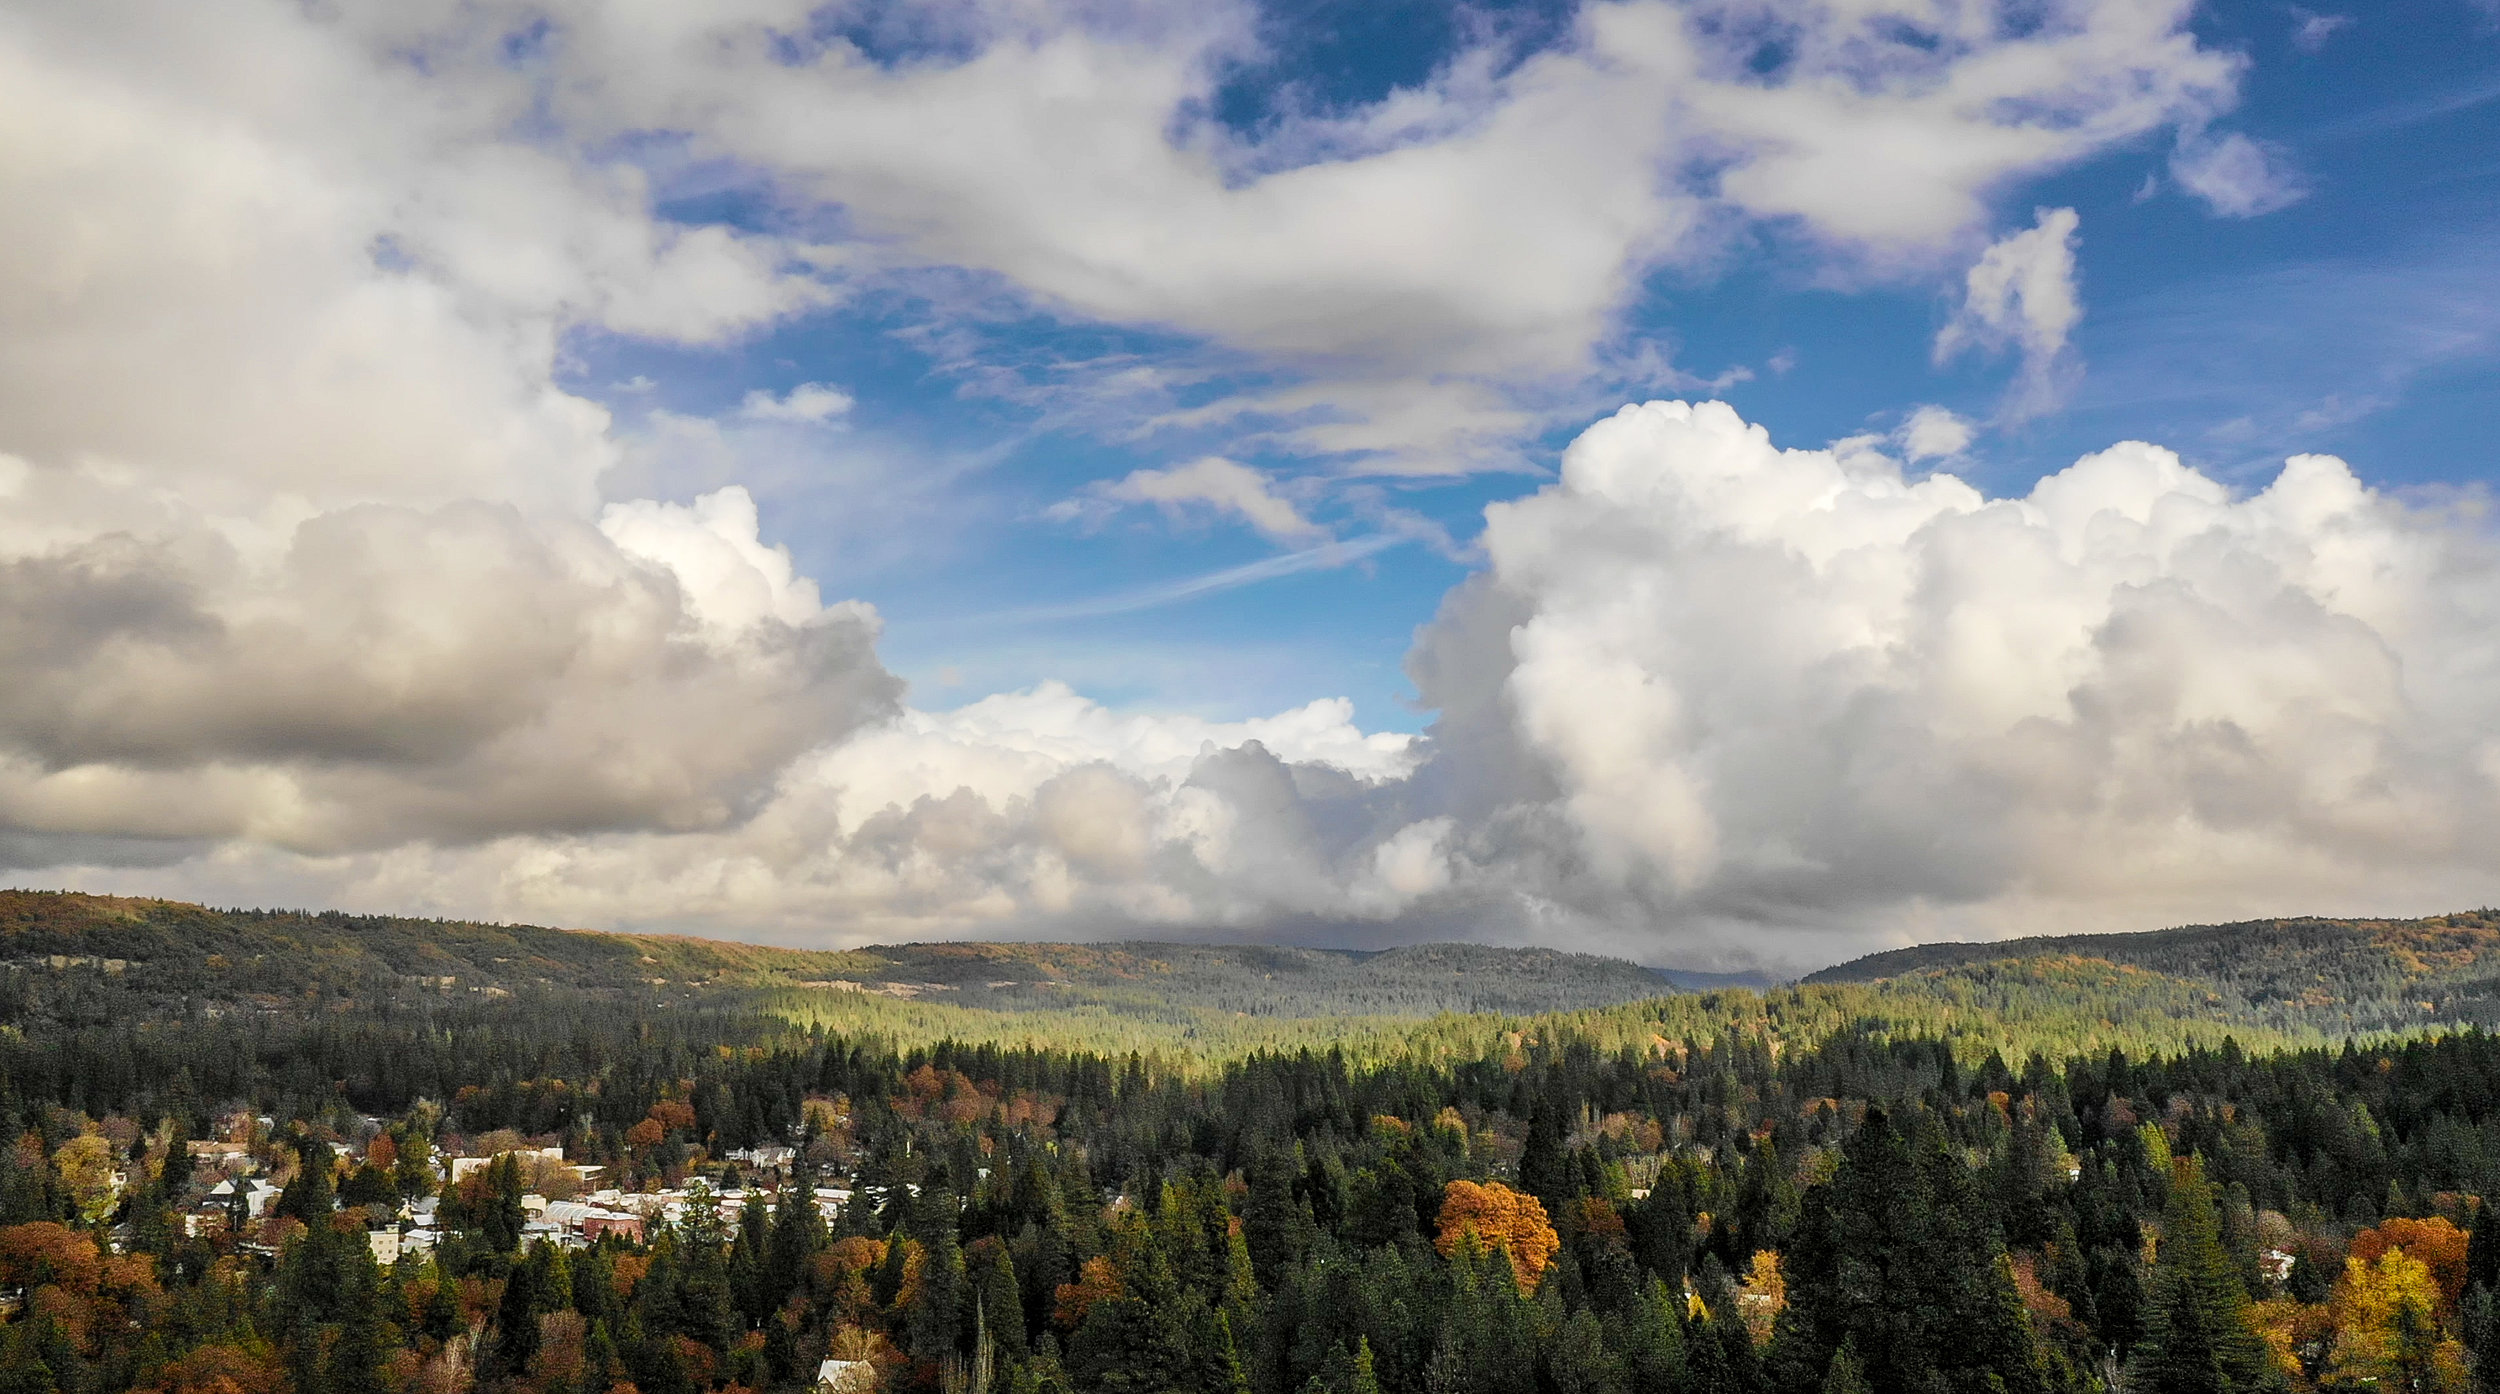 A DRONE VIEW AT 400 FEET AGL TOWARDS NEVADA CITY, CALIFORNIA. NOVEMBER 28, 2018